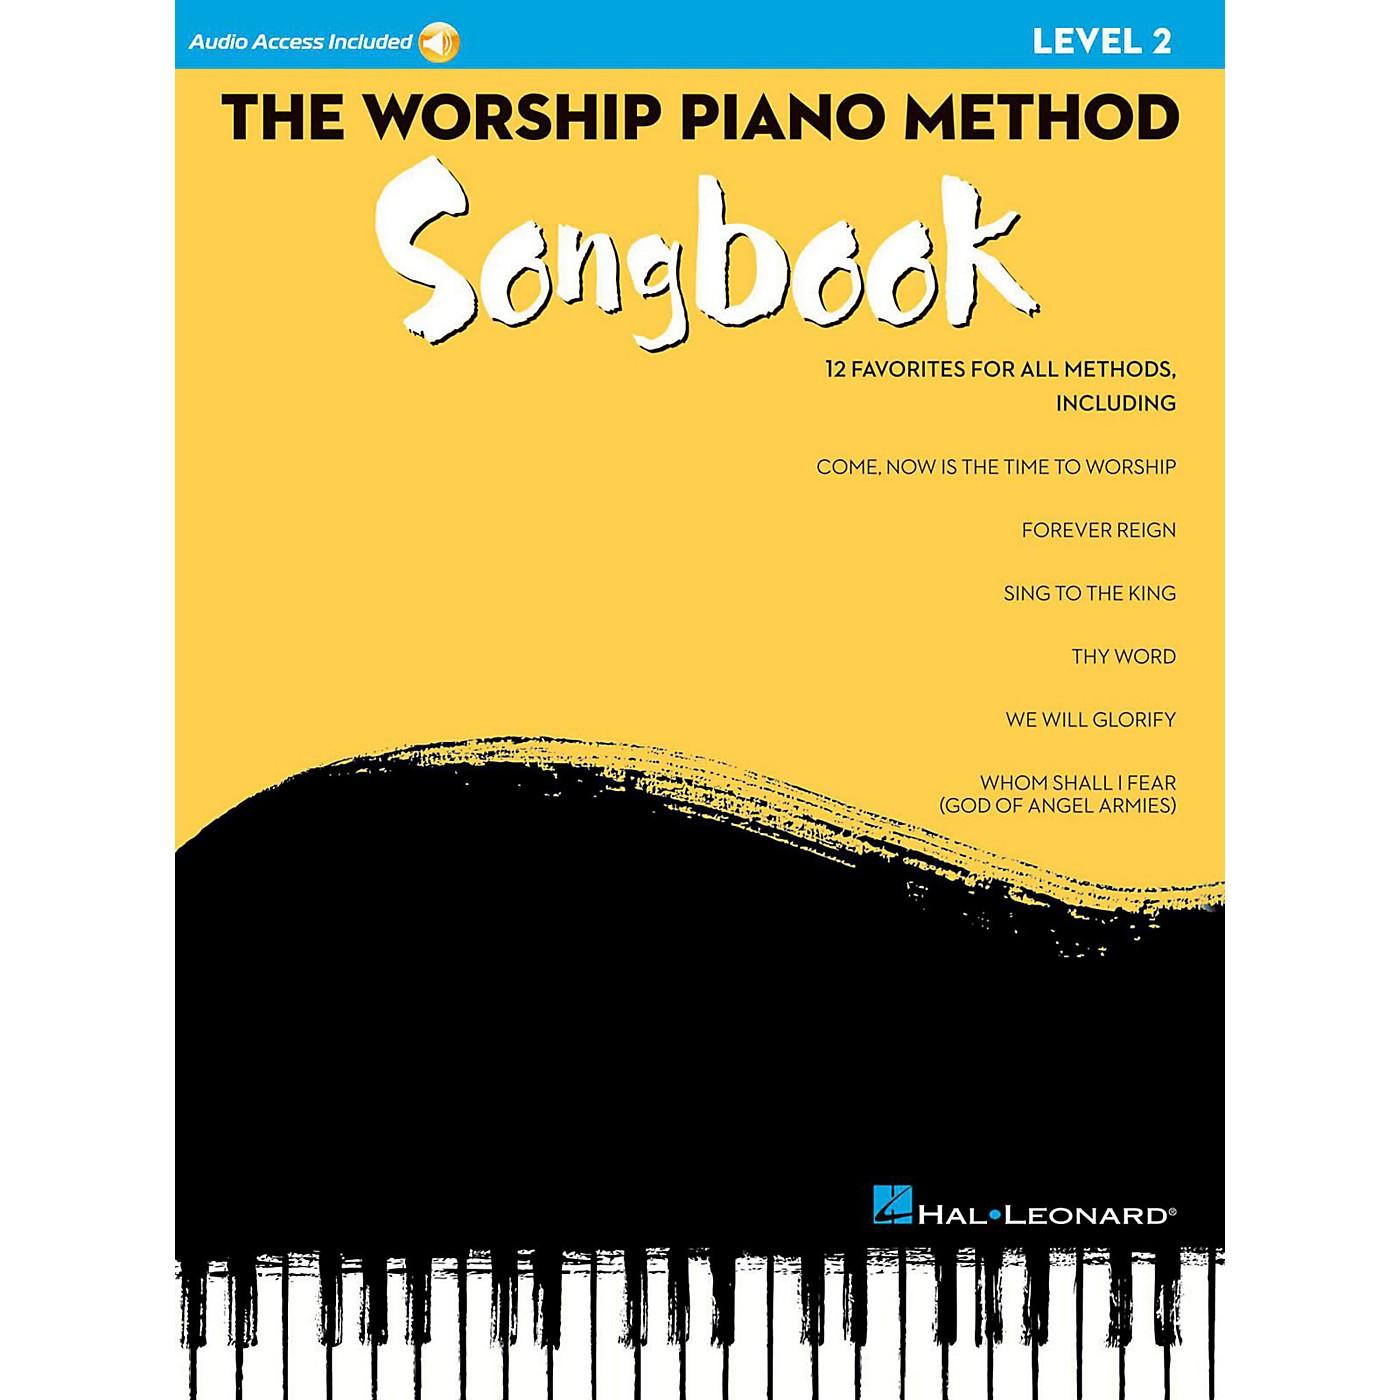 Hal Leonard The Worship Piano Method Songbook - Level 2 Book w/ Audio Online thumbnail